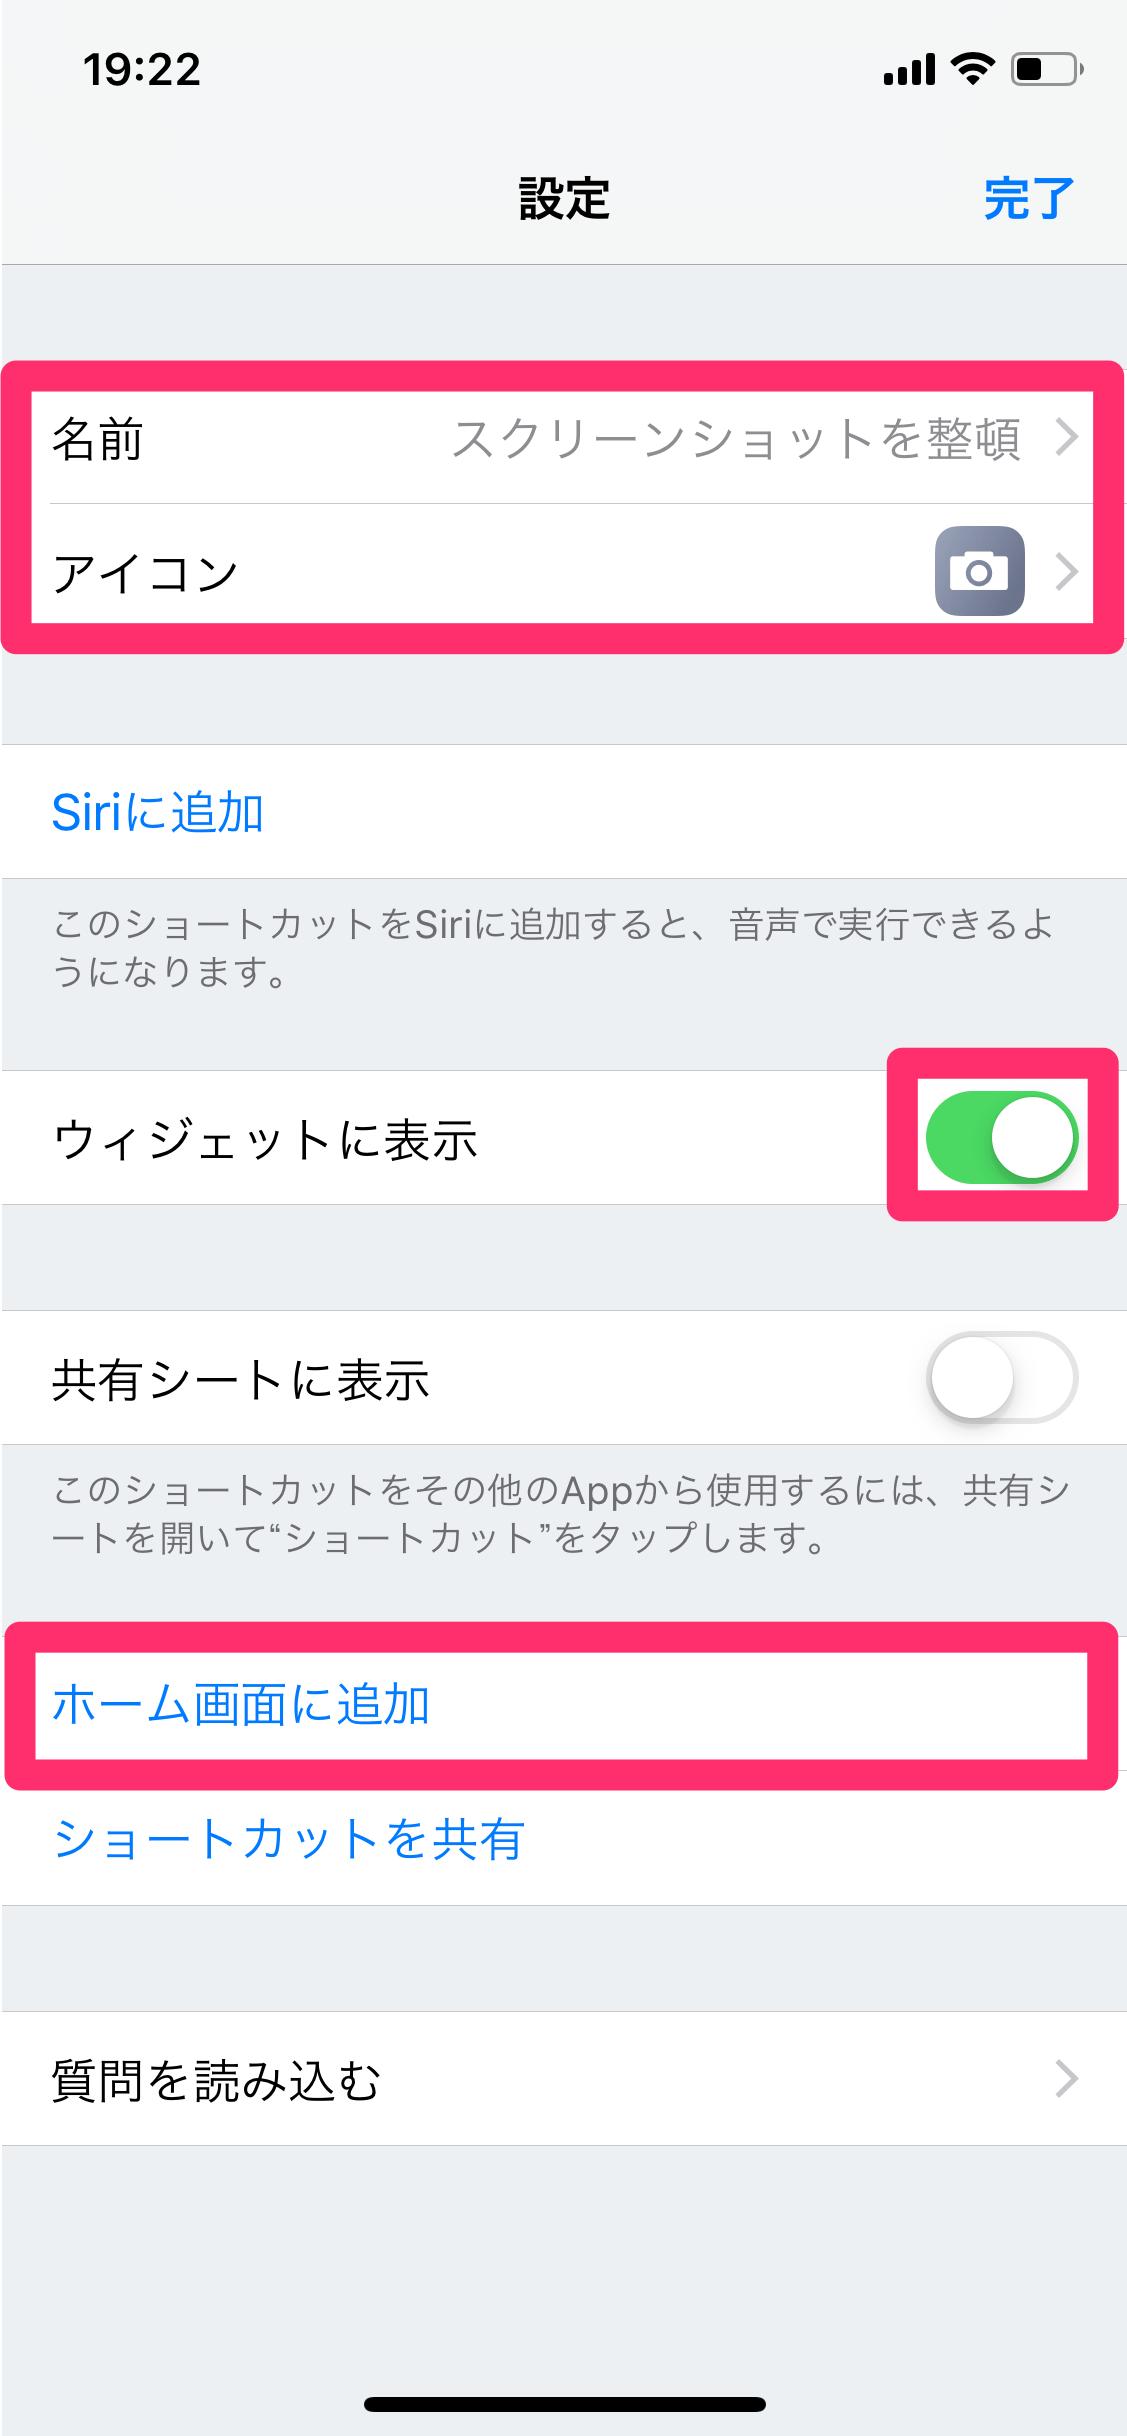 【iOS12新機能】スクショだけを自動選択して削除! 写真の整頓に超絶便利な「ショートカット」アプリ活用